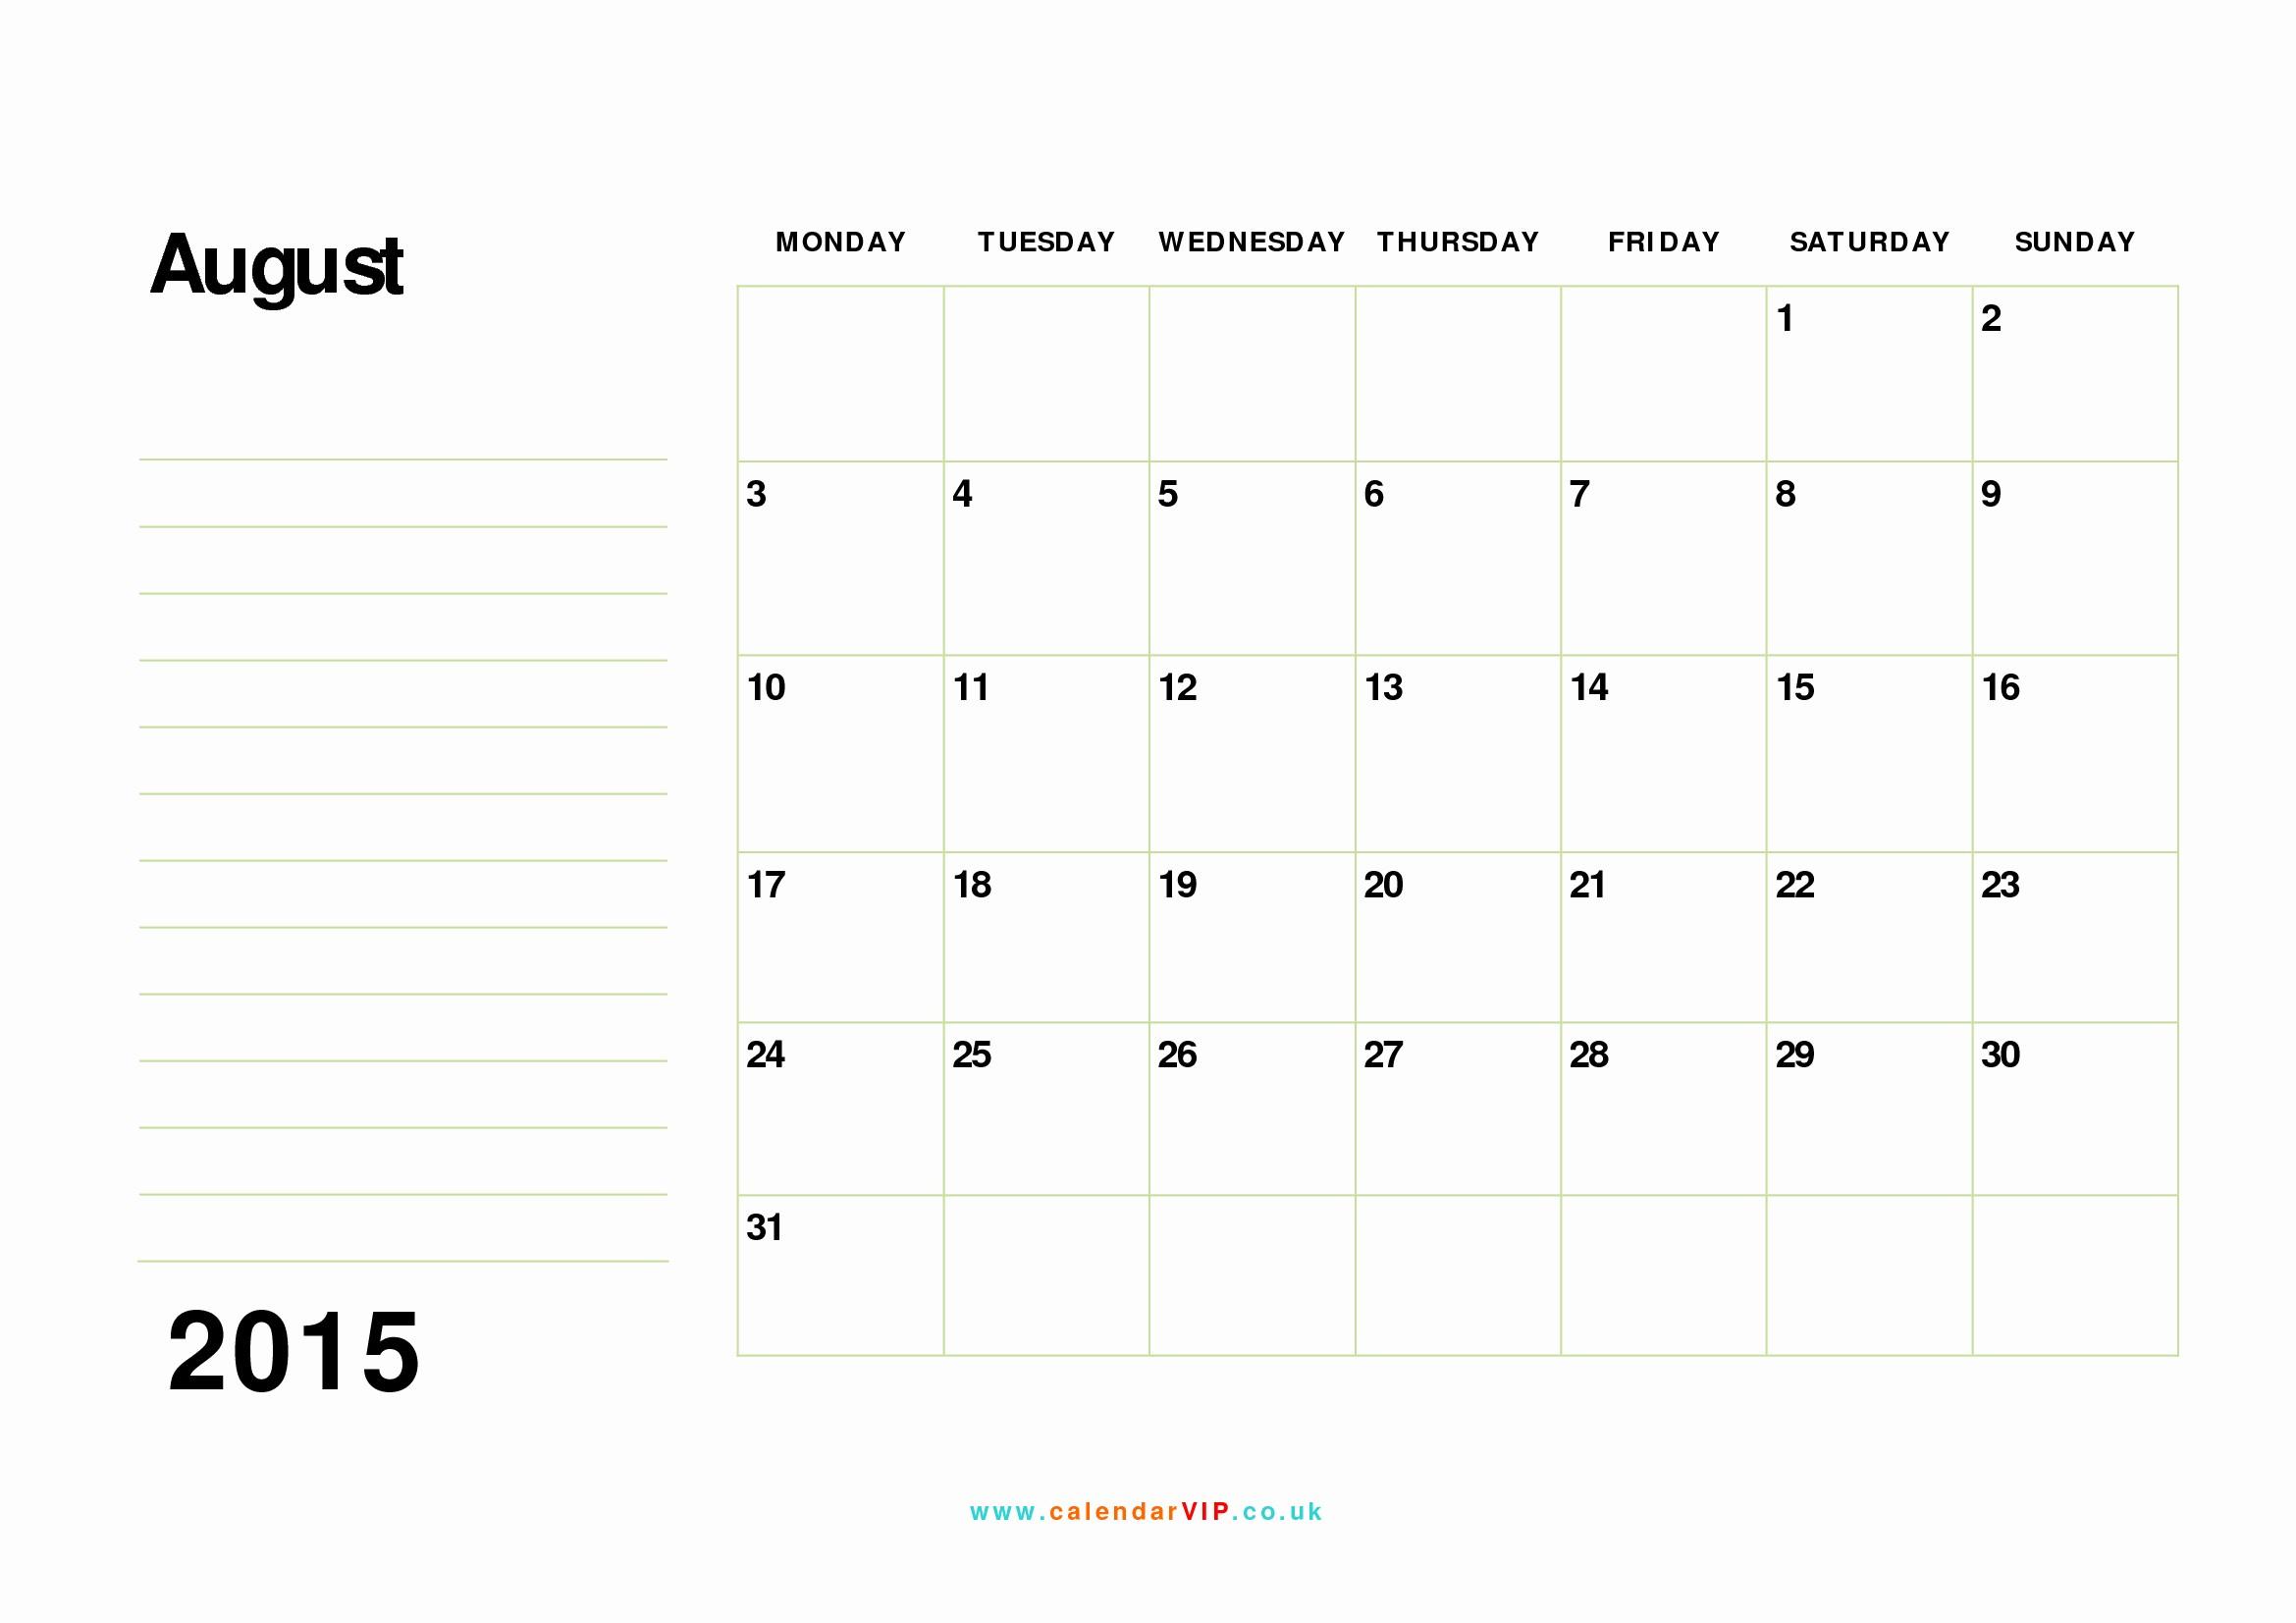 Free Calendar Templates August 2015 Inspirational August 2015 Calendar Free Monthly Calendar Templates for Uk